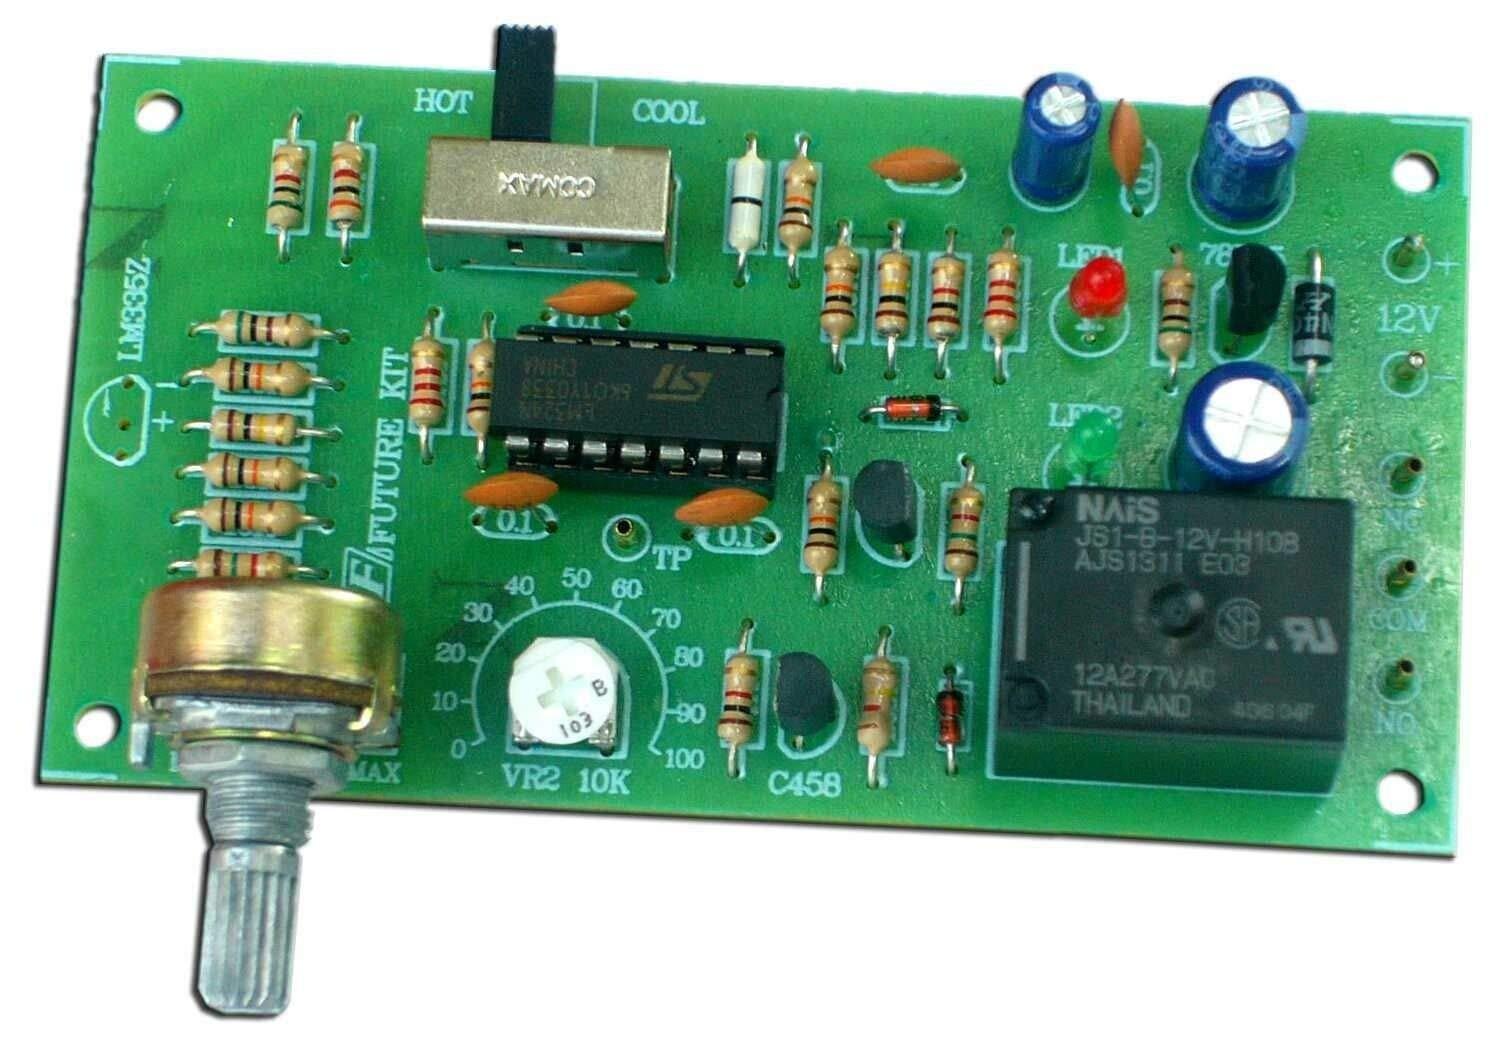 12V Temperature Control/Thermostat 0˚ to 100˚C Kit [ Assembled Kit ]